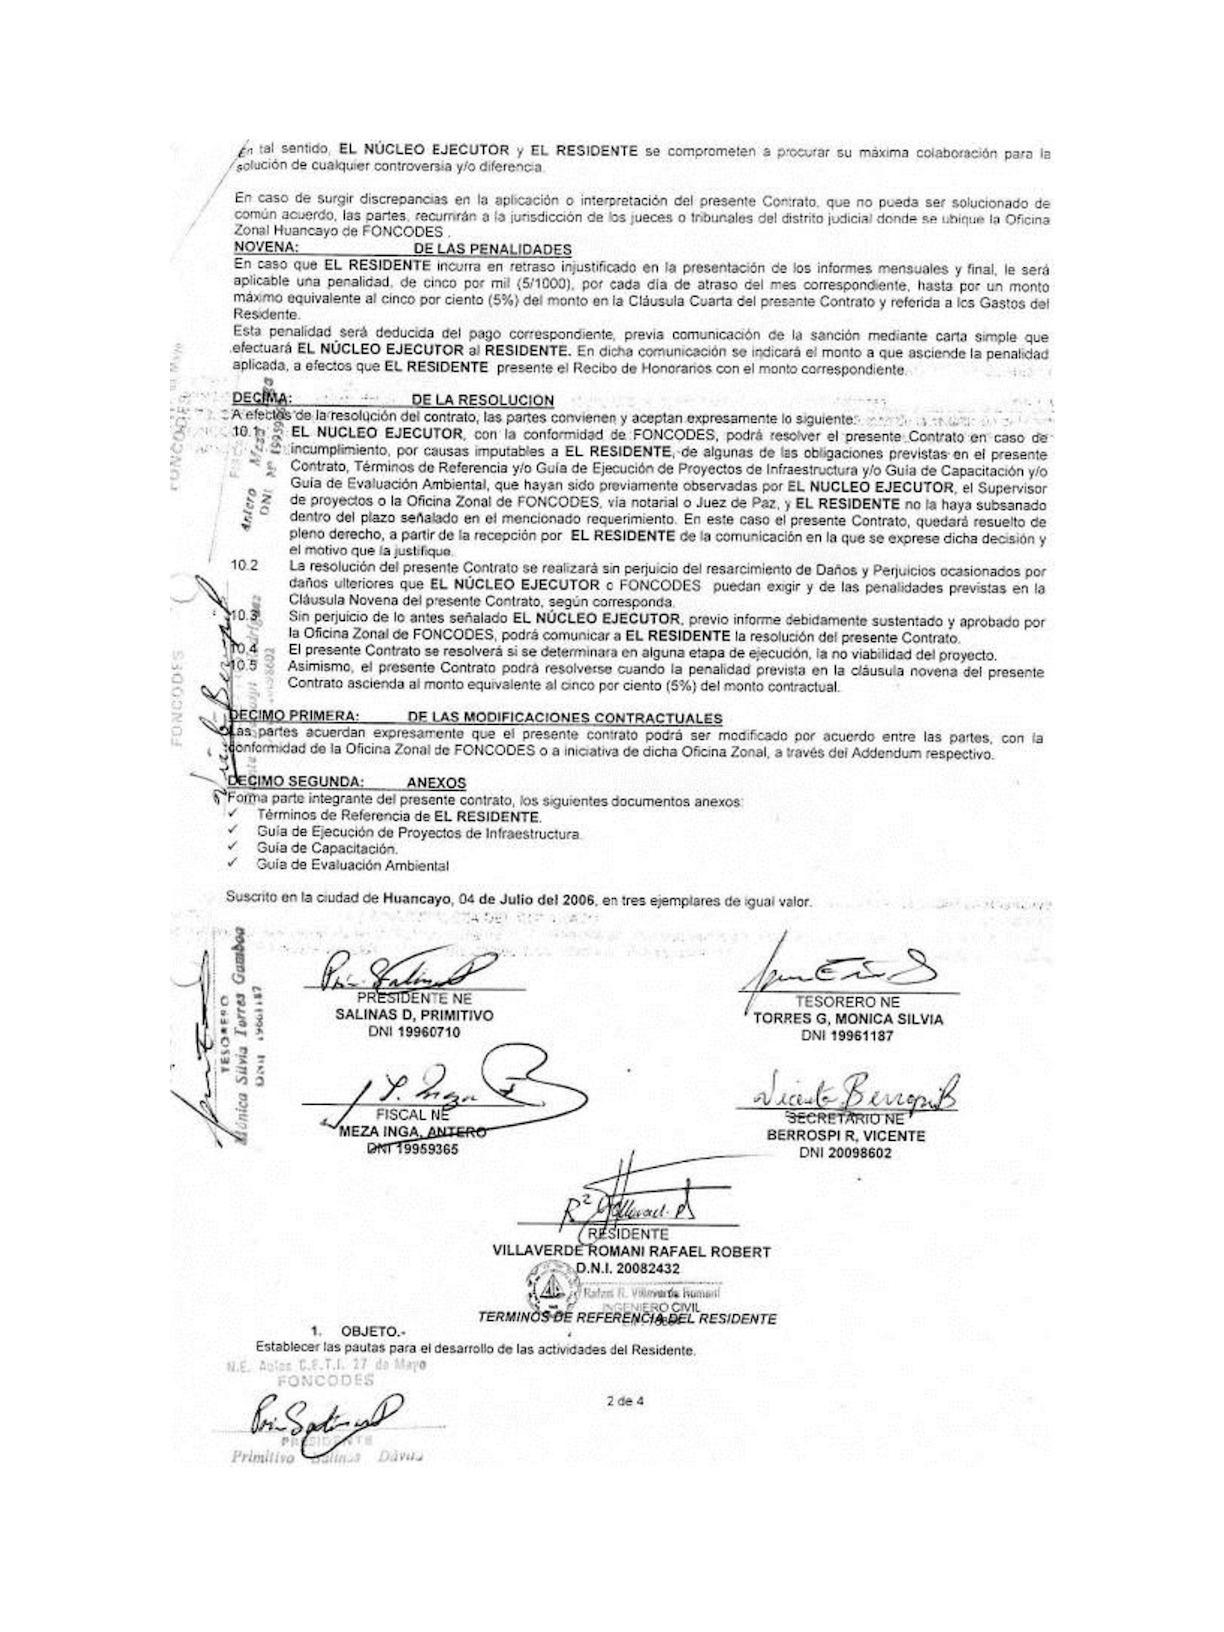 Lujoso Curriculum Vitae Para El Gerente Bancario Retirado Adorno ...